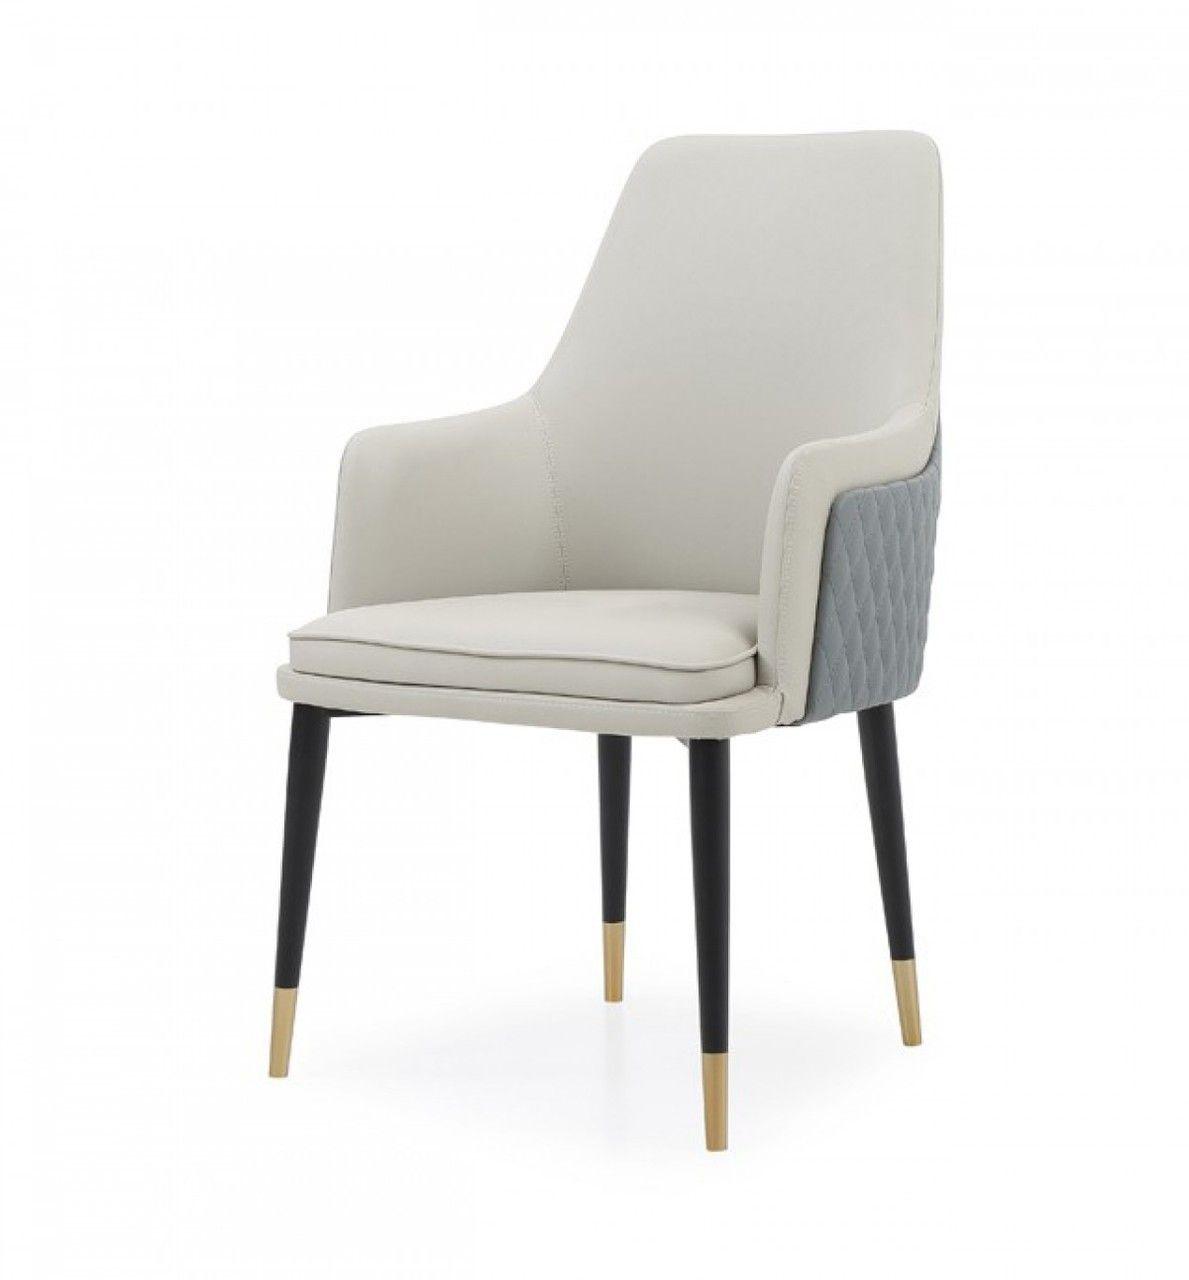 Stylish Design Furniture Modrest Duval Modern White Furniture Gray Dining Chairs Furniture Design